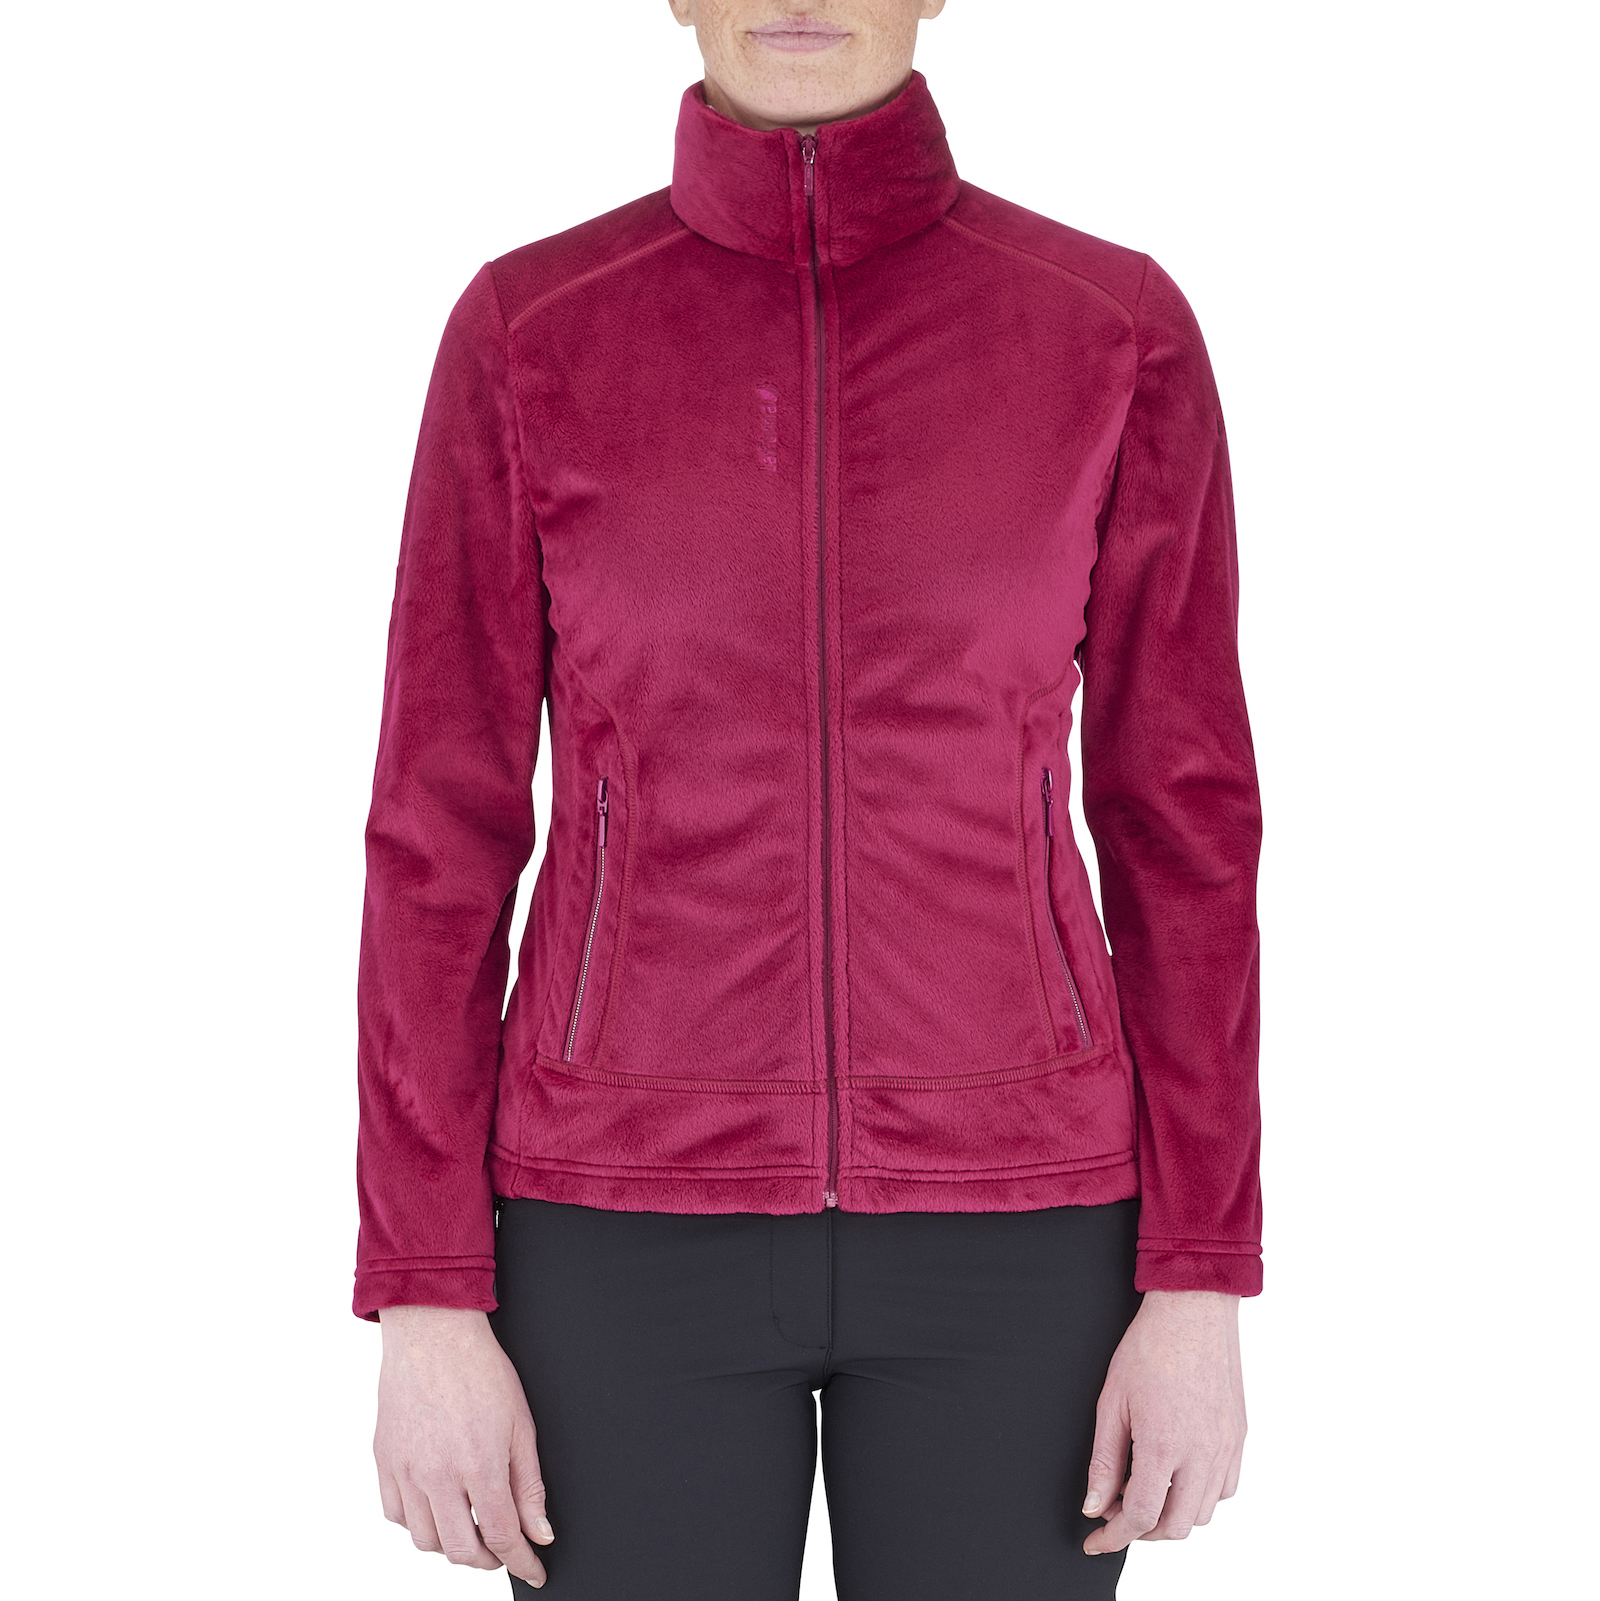 Lafuma - LD Alpic Full Zip - Fleece jacket - Men's - 2017